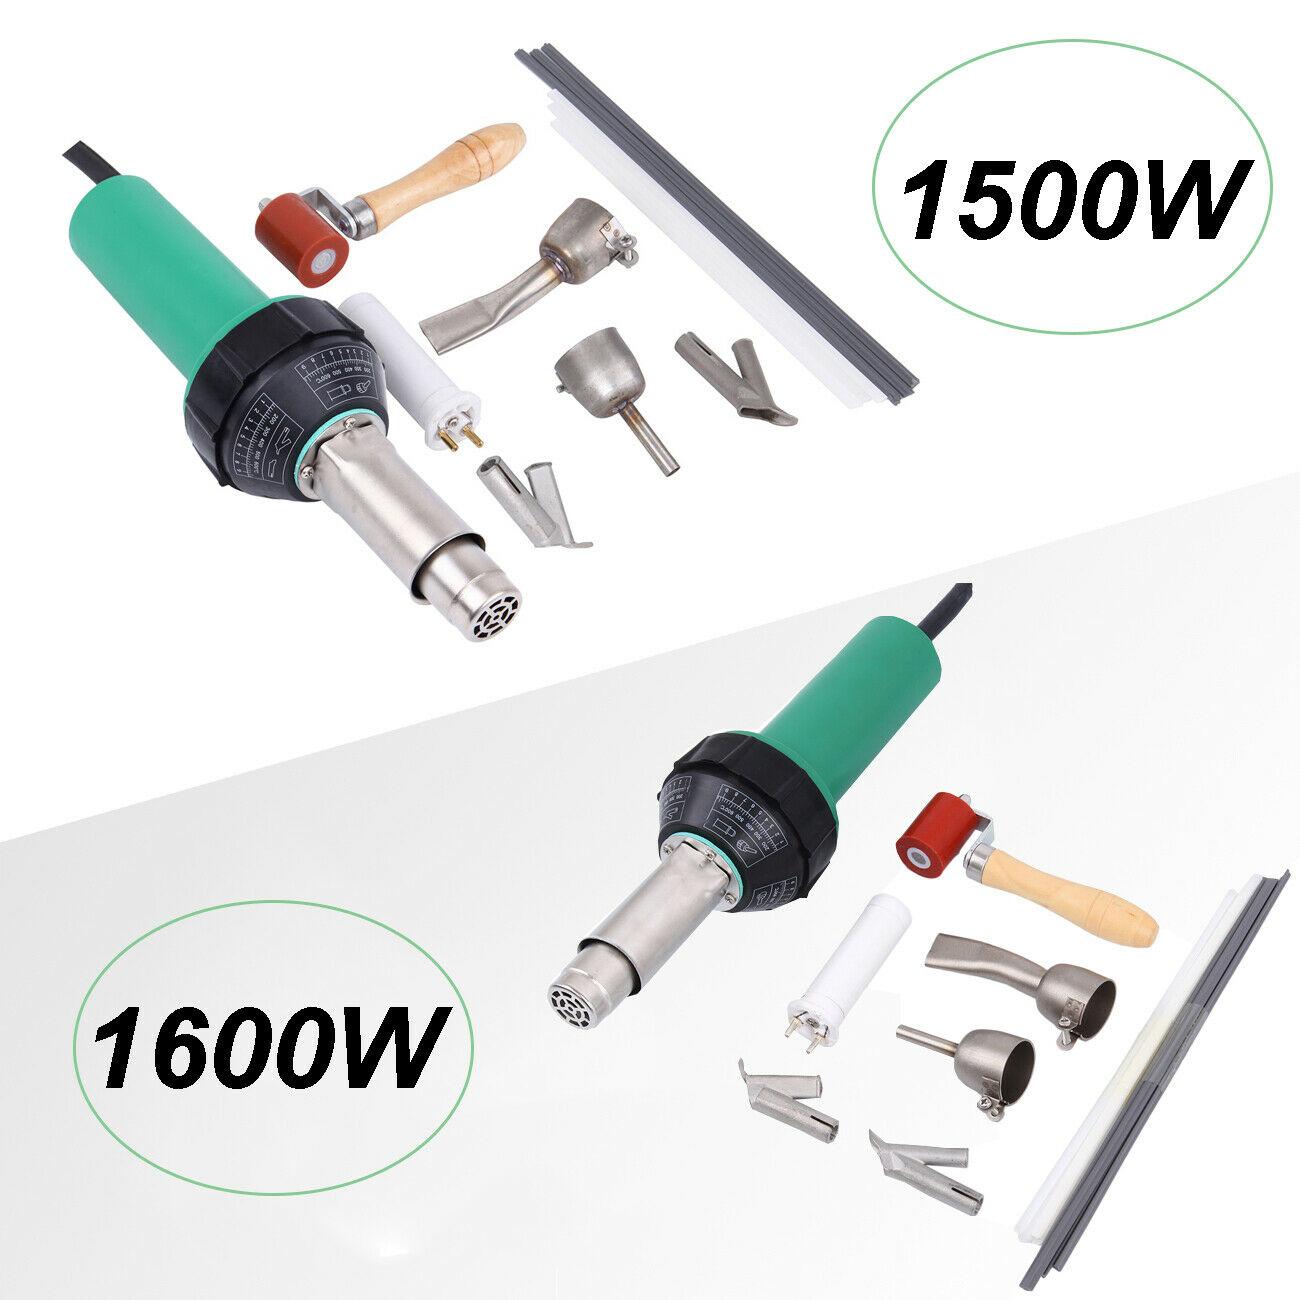 Honhill AC 220V 1500W/1600W Hot Air Torch Plastic Welder Welding Heat Gun Pistol Kit With Welder + Nozzle + PVC Plastic Rod Kit